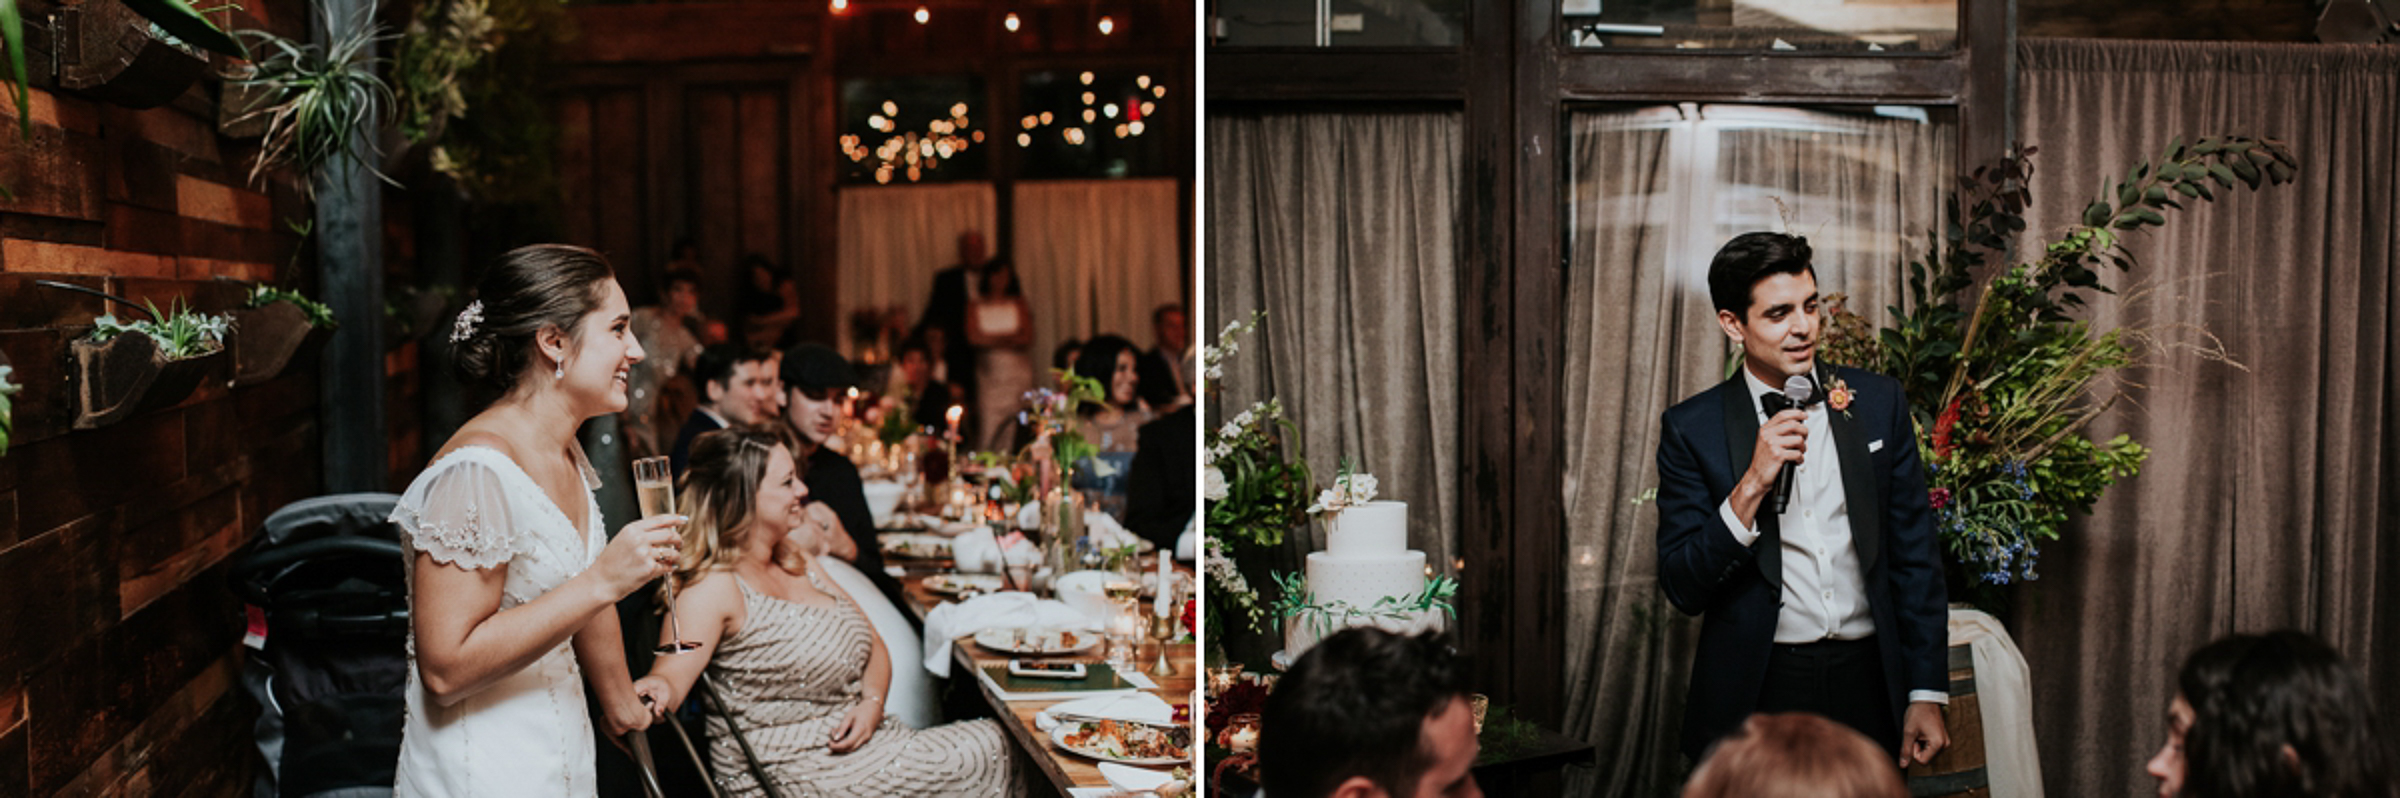 Brooklyn-Winery-NYC-Editorial-Documentary-Wedding-Photographer-Gina-Oli-134.jpg